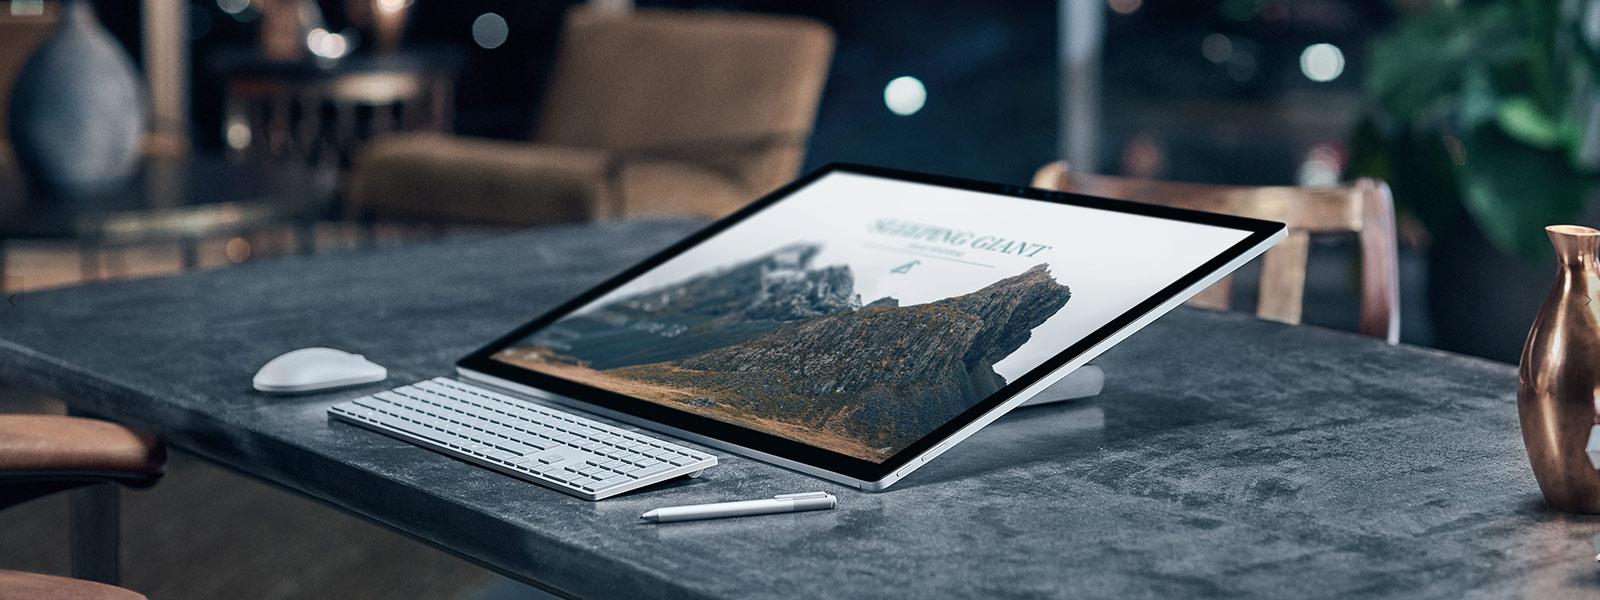 Surface Studio on desk in studio mode